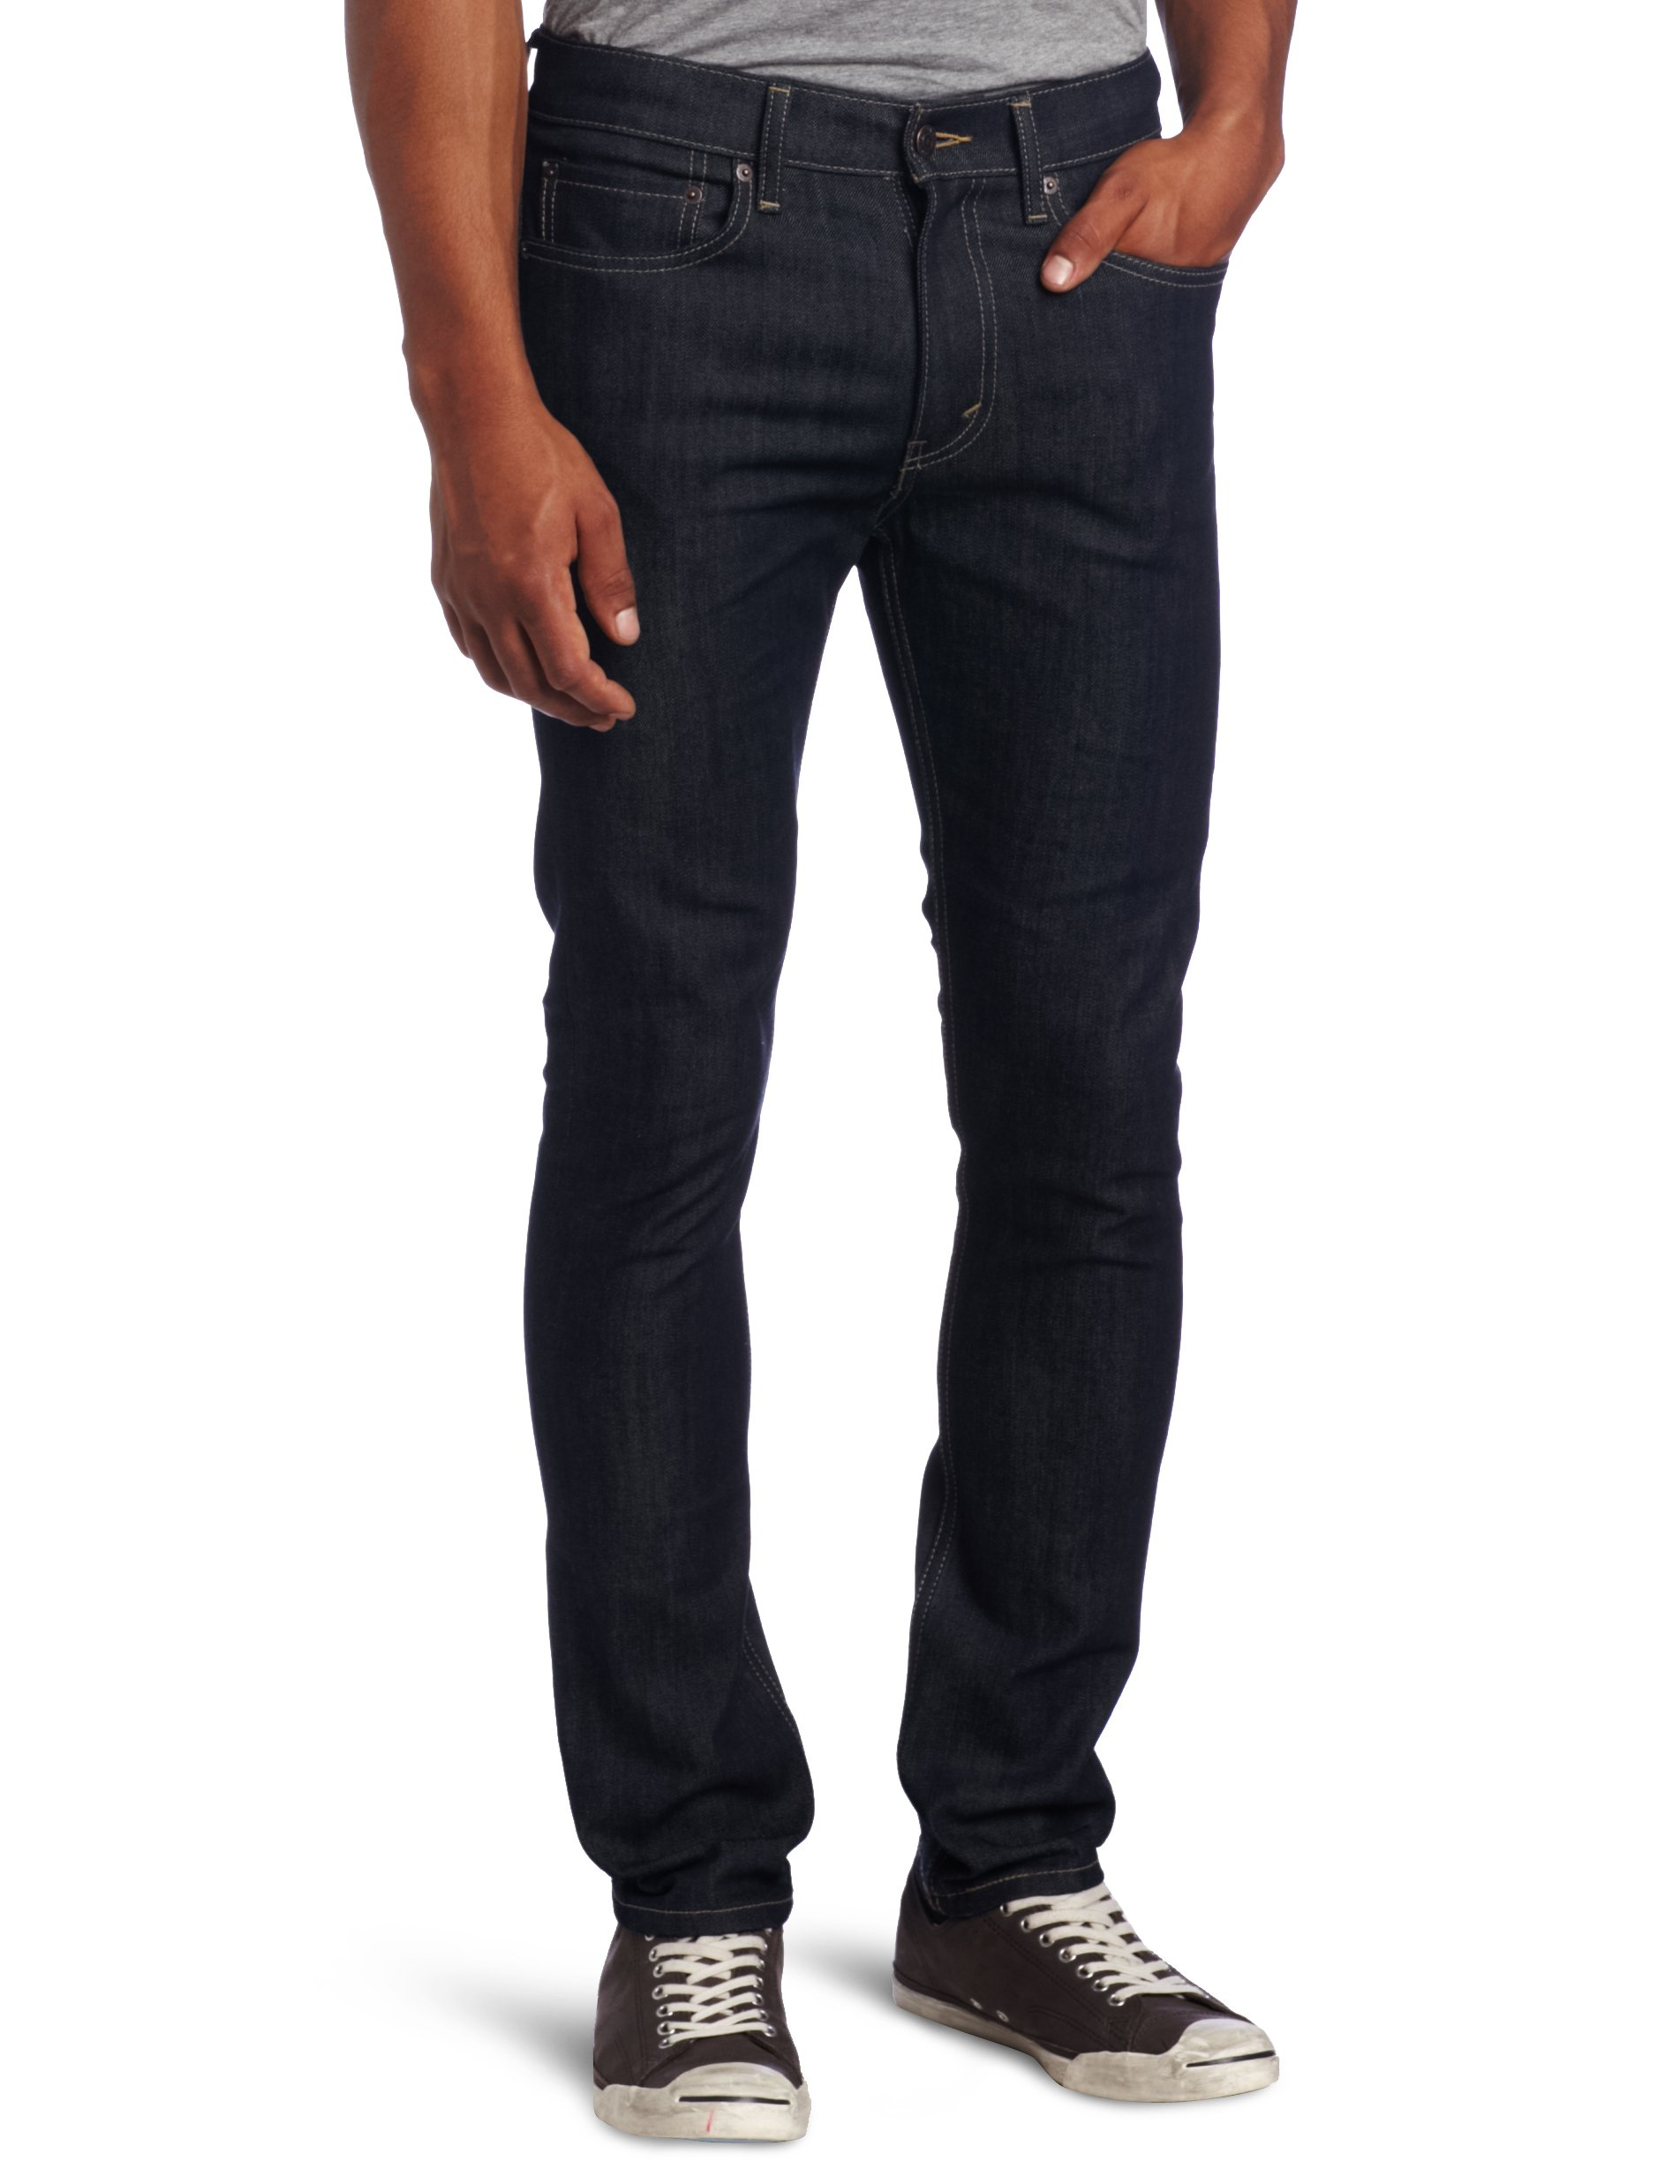 Levi's Men's 510 Skinny Fit Jean, Rigid Stretch, 32x32 by Levi's